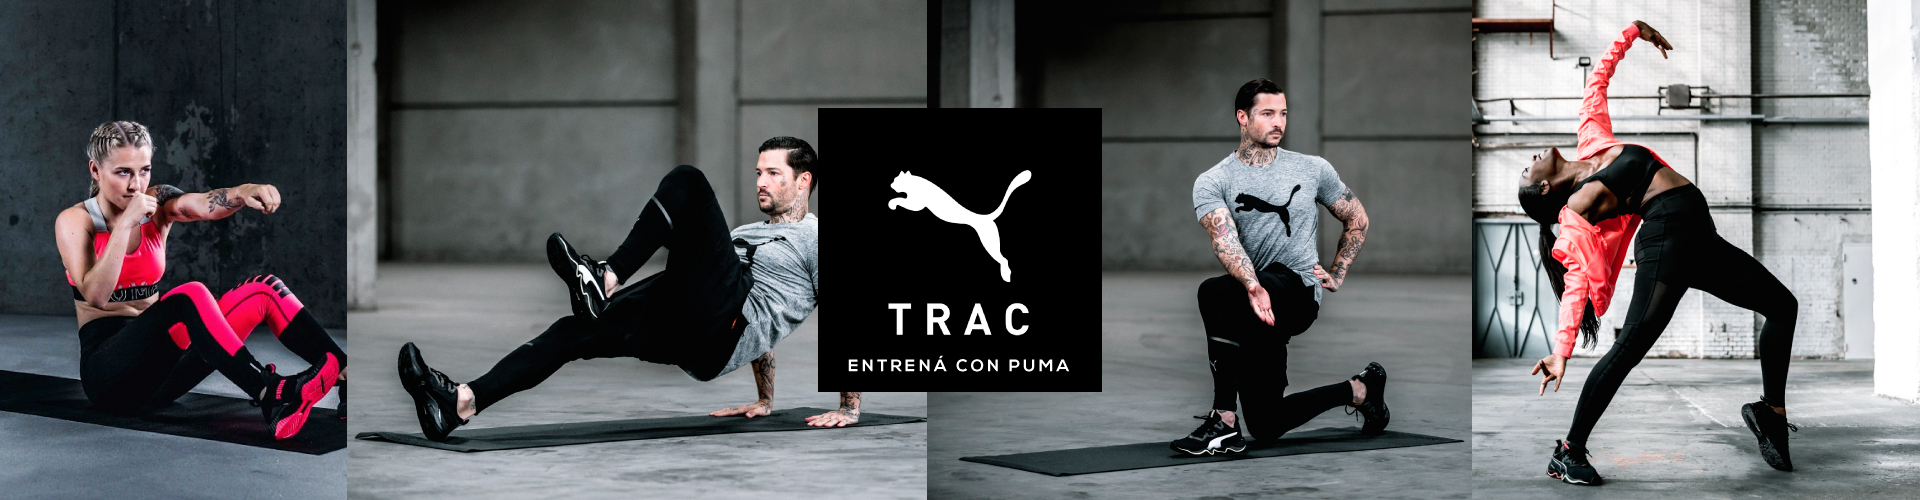 Puma Trac